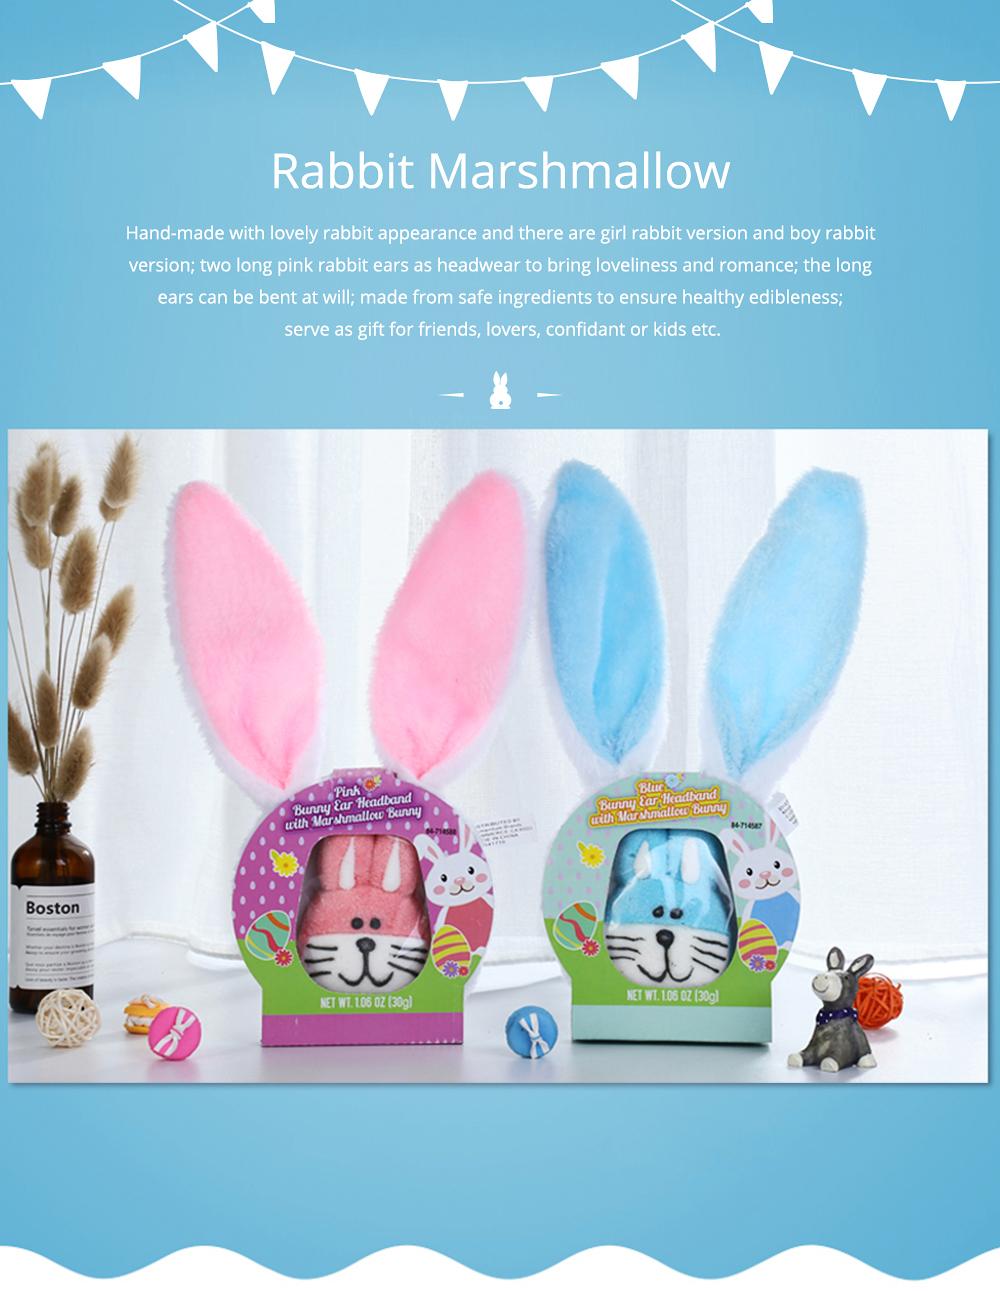 Rabbit Shape Marshmallow for Girlfriend as Birthday Gift, Creative Rabbit Cotton Candy A Pair as Present Rabbit Candy Floss 0